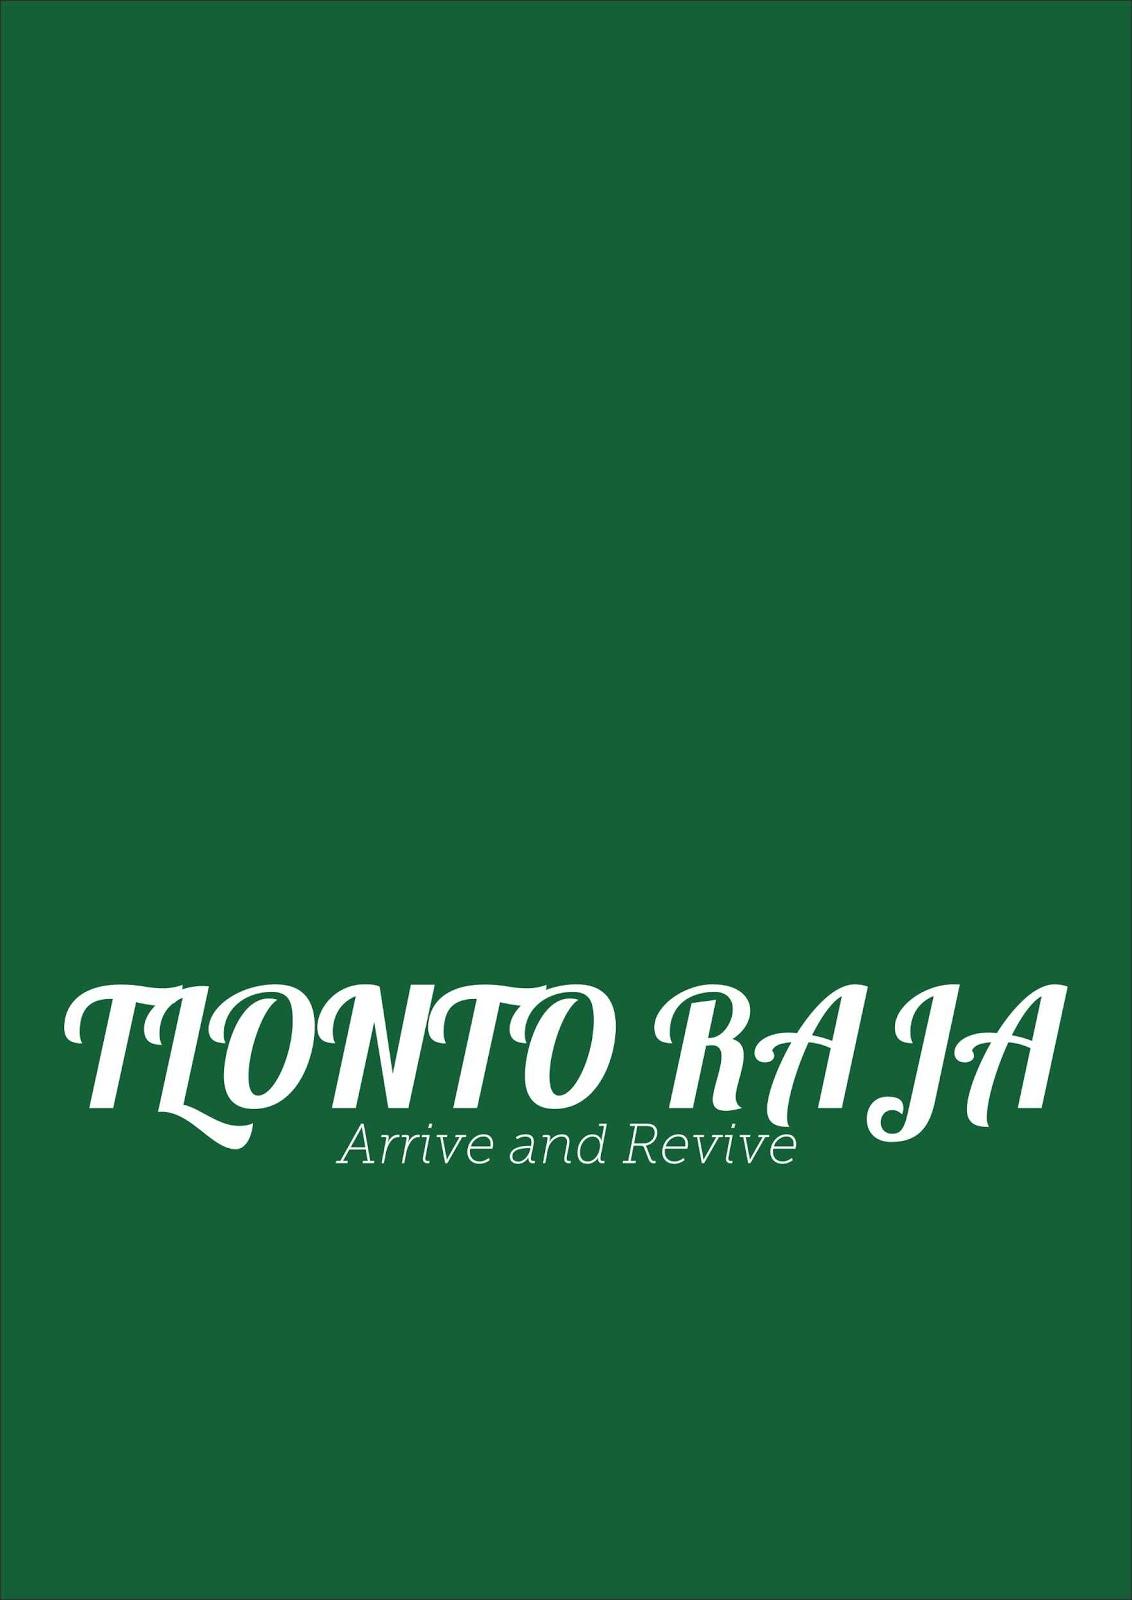 Untuk Desa Tlonto Raja